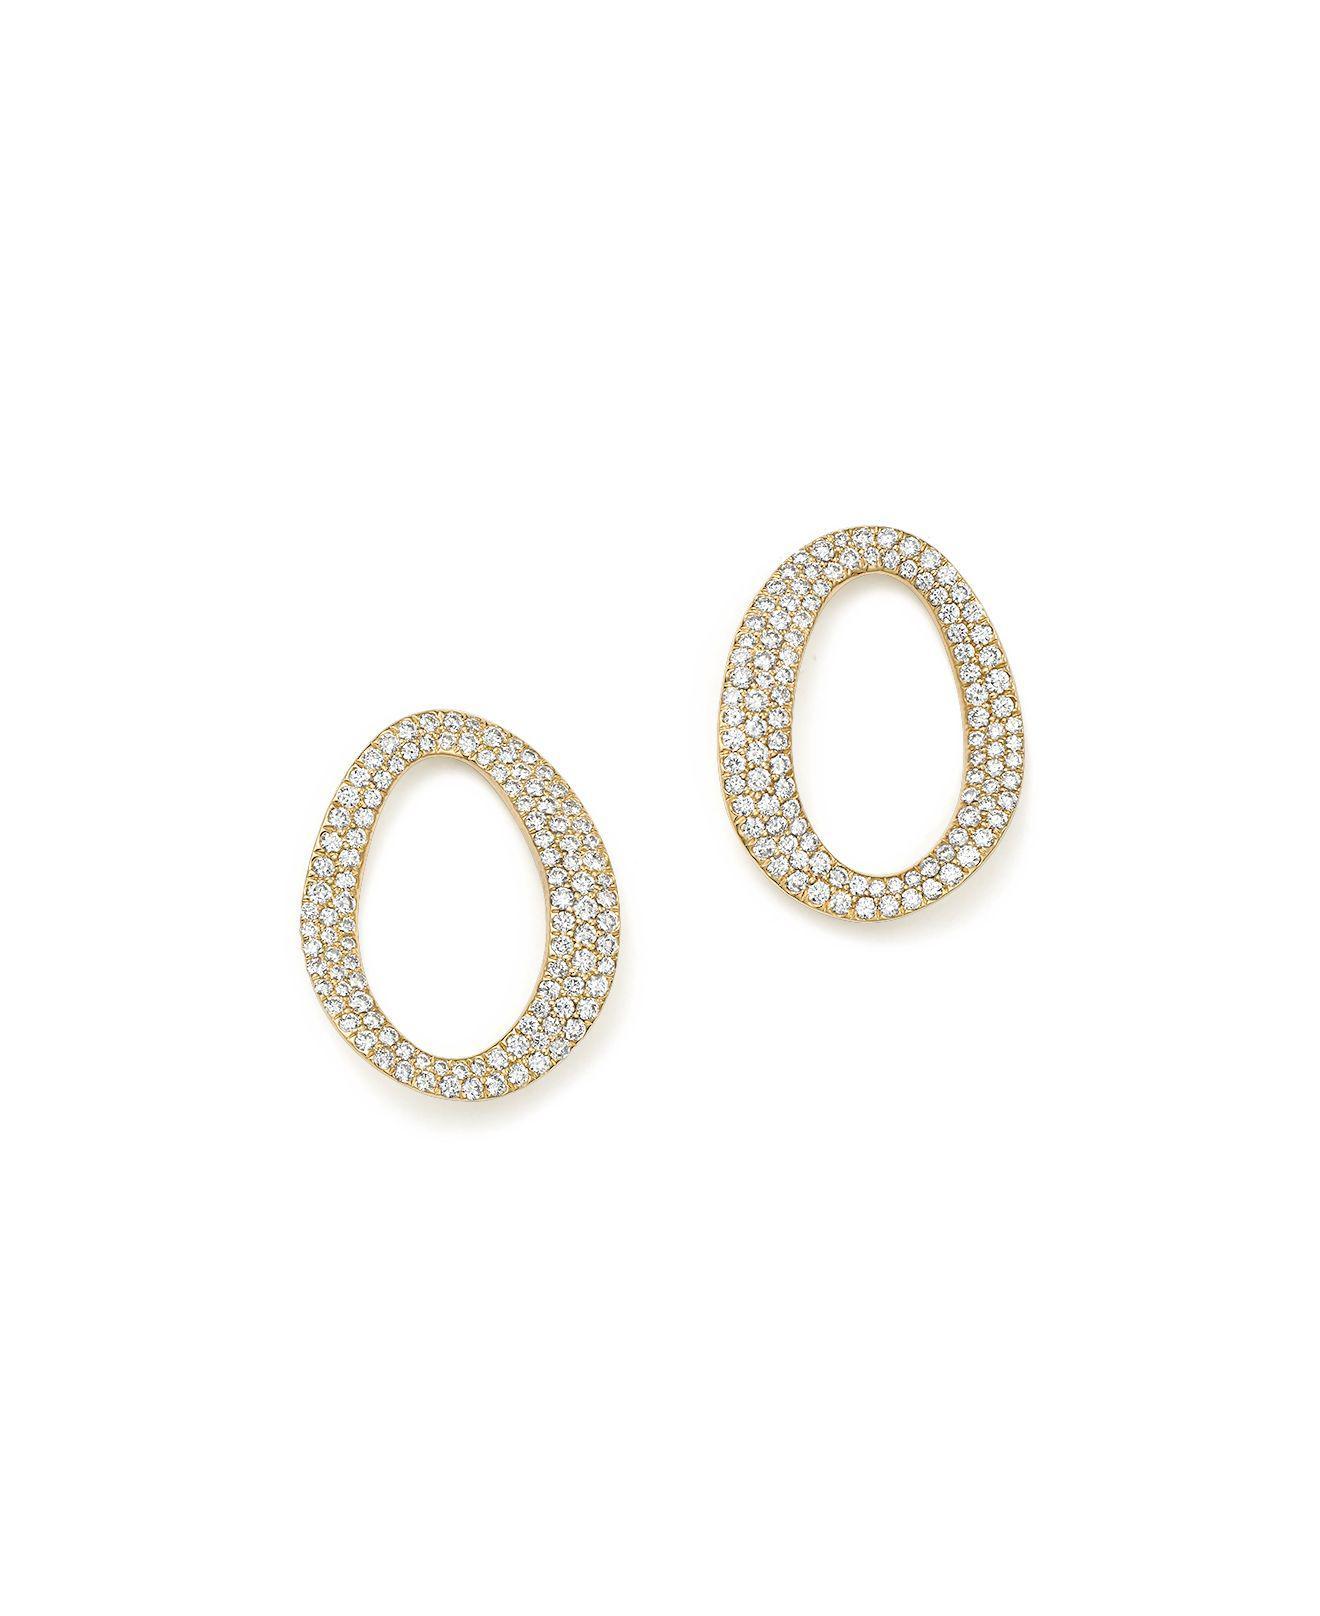 Ippolita Cherish Small Link Earrings with Diamonds 46tH061